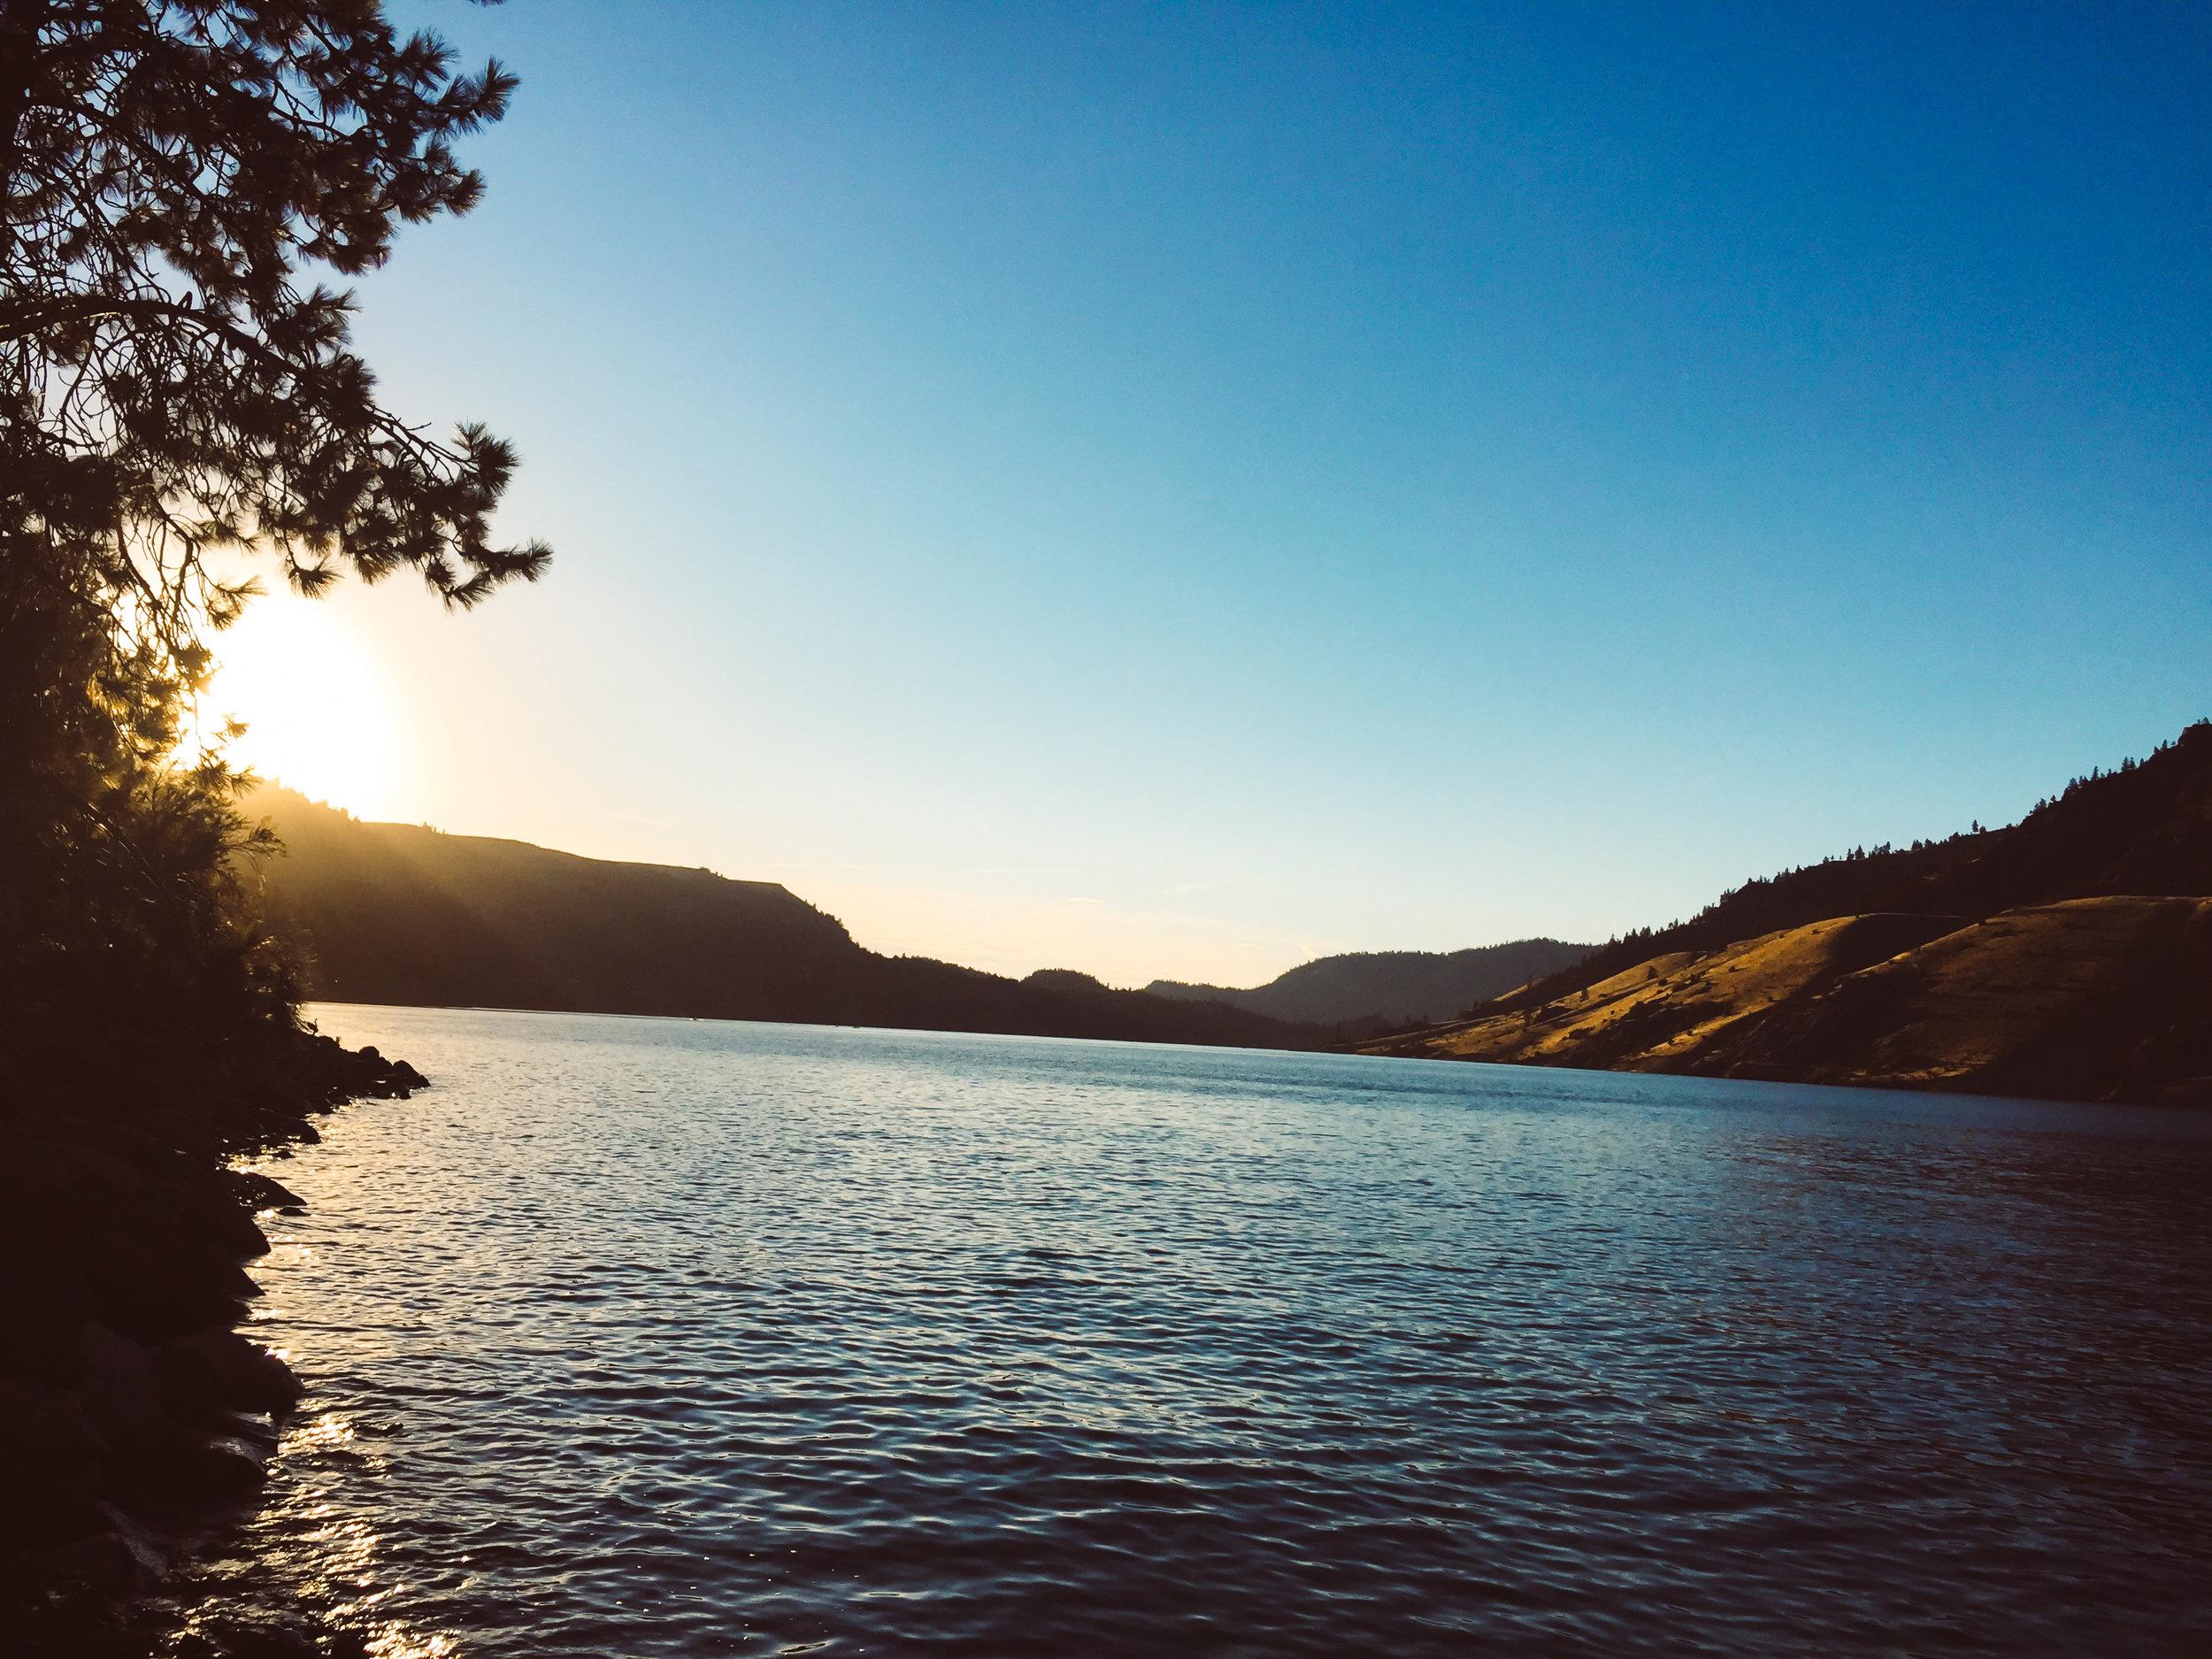 Sunset view of Lake Roosevelt